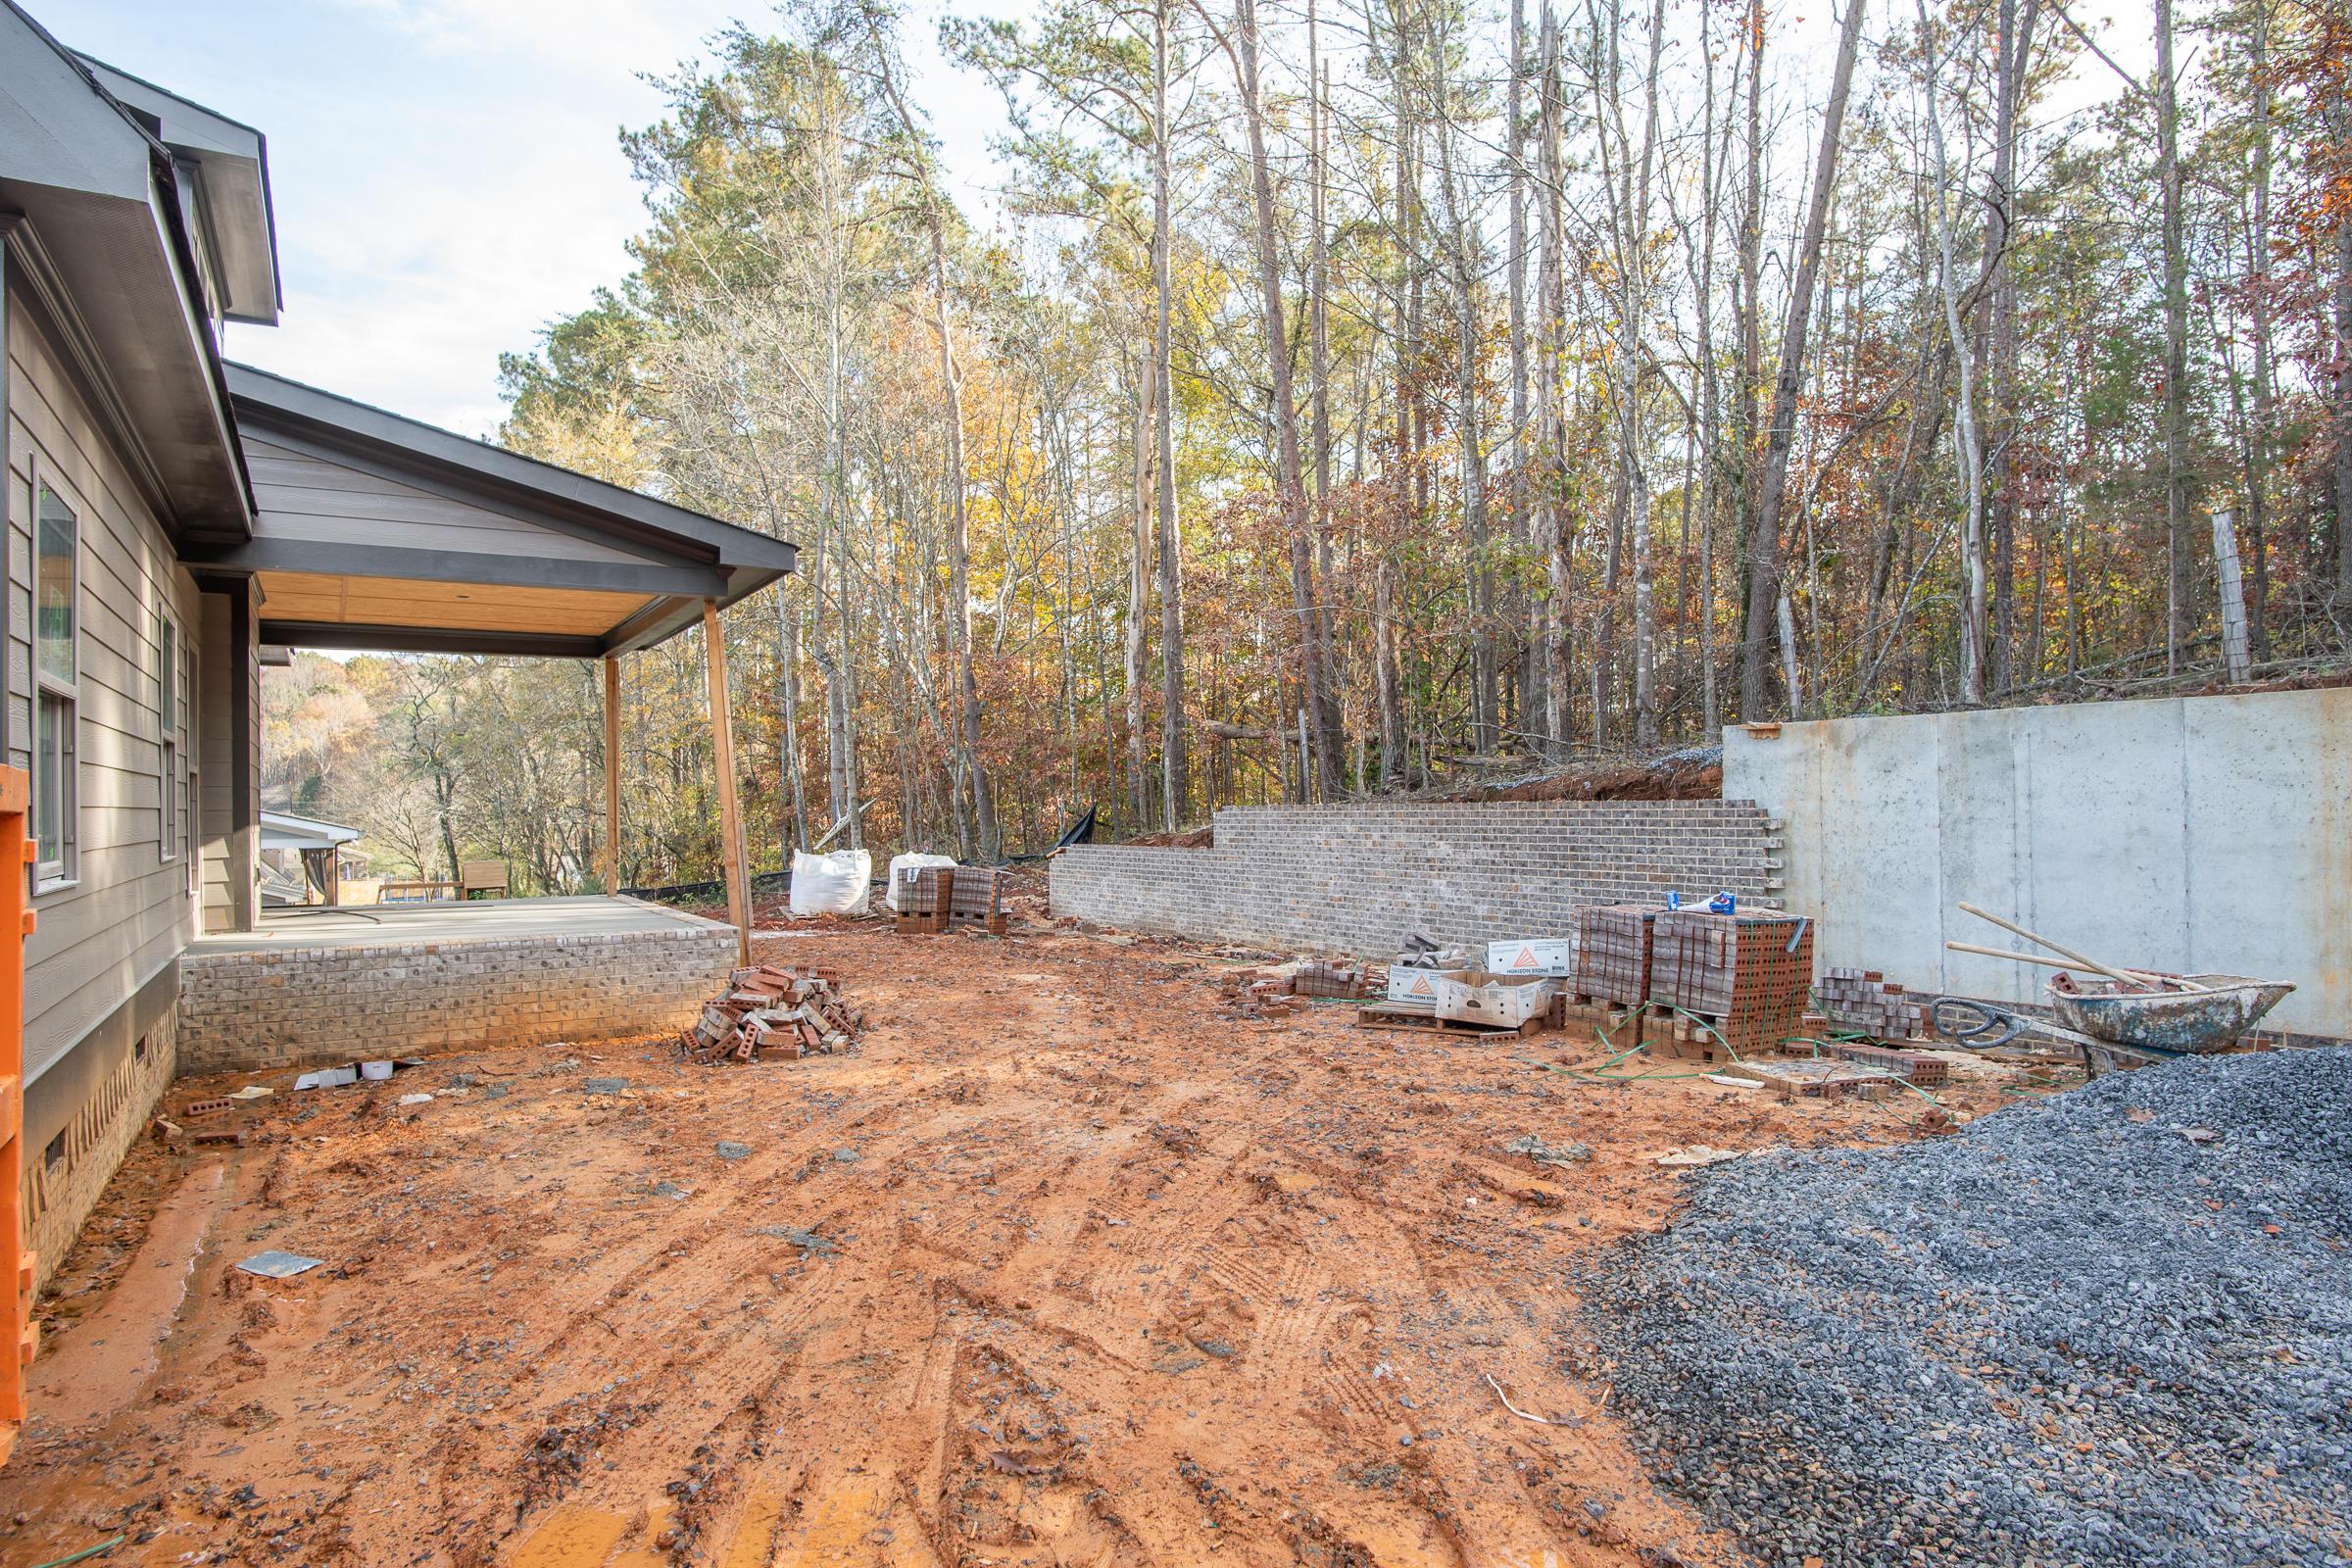 3443 Hawks Creek Dr Apison, Tn, Apison, TN 37302